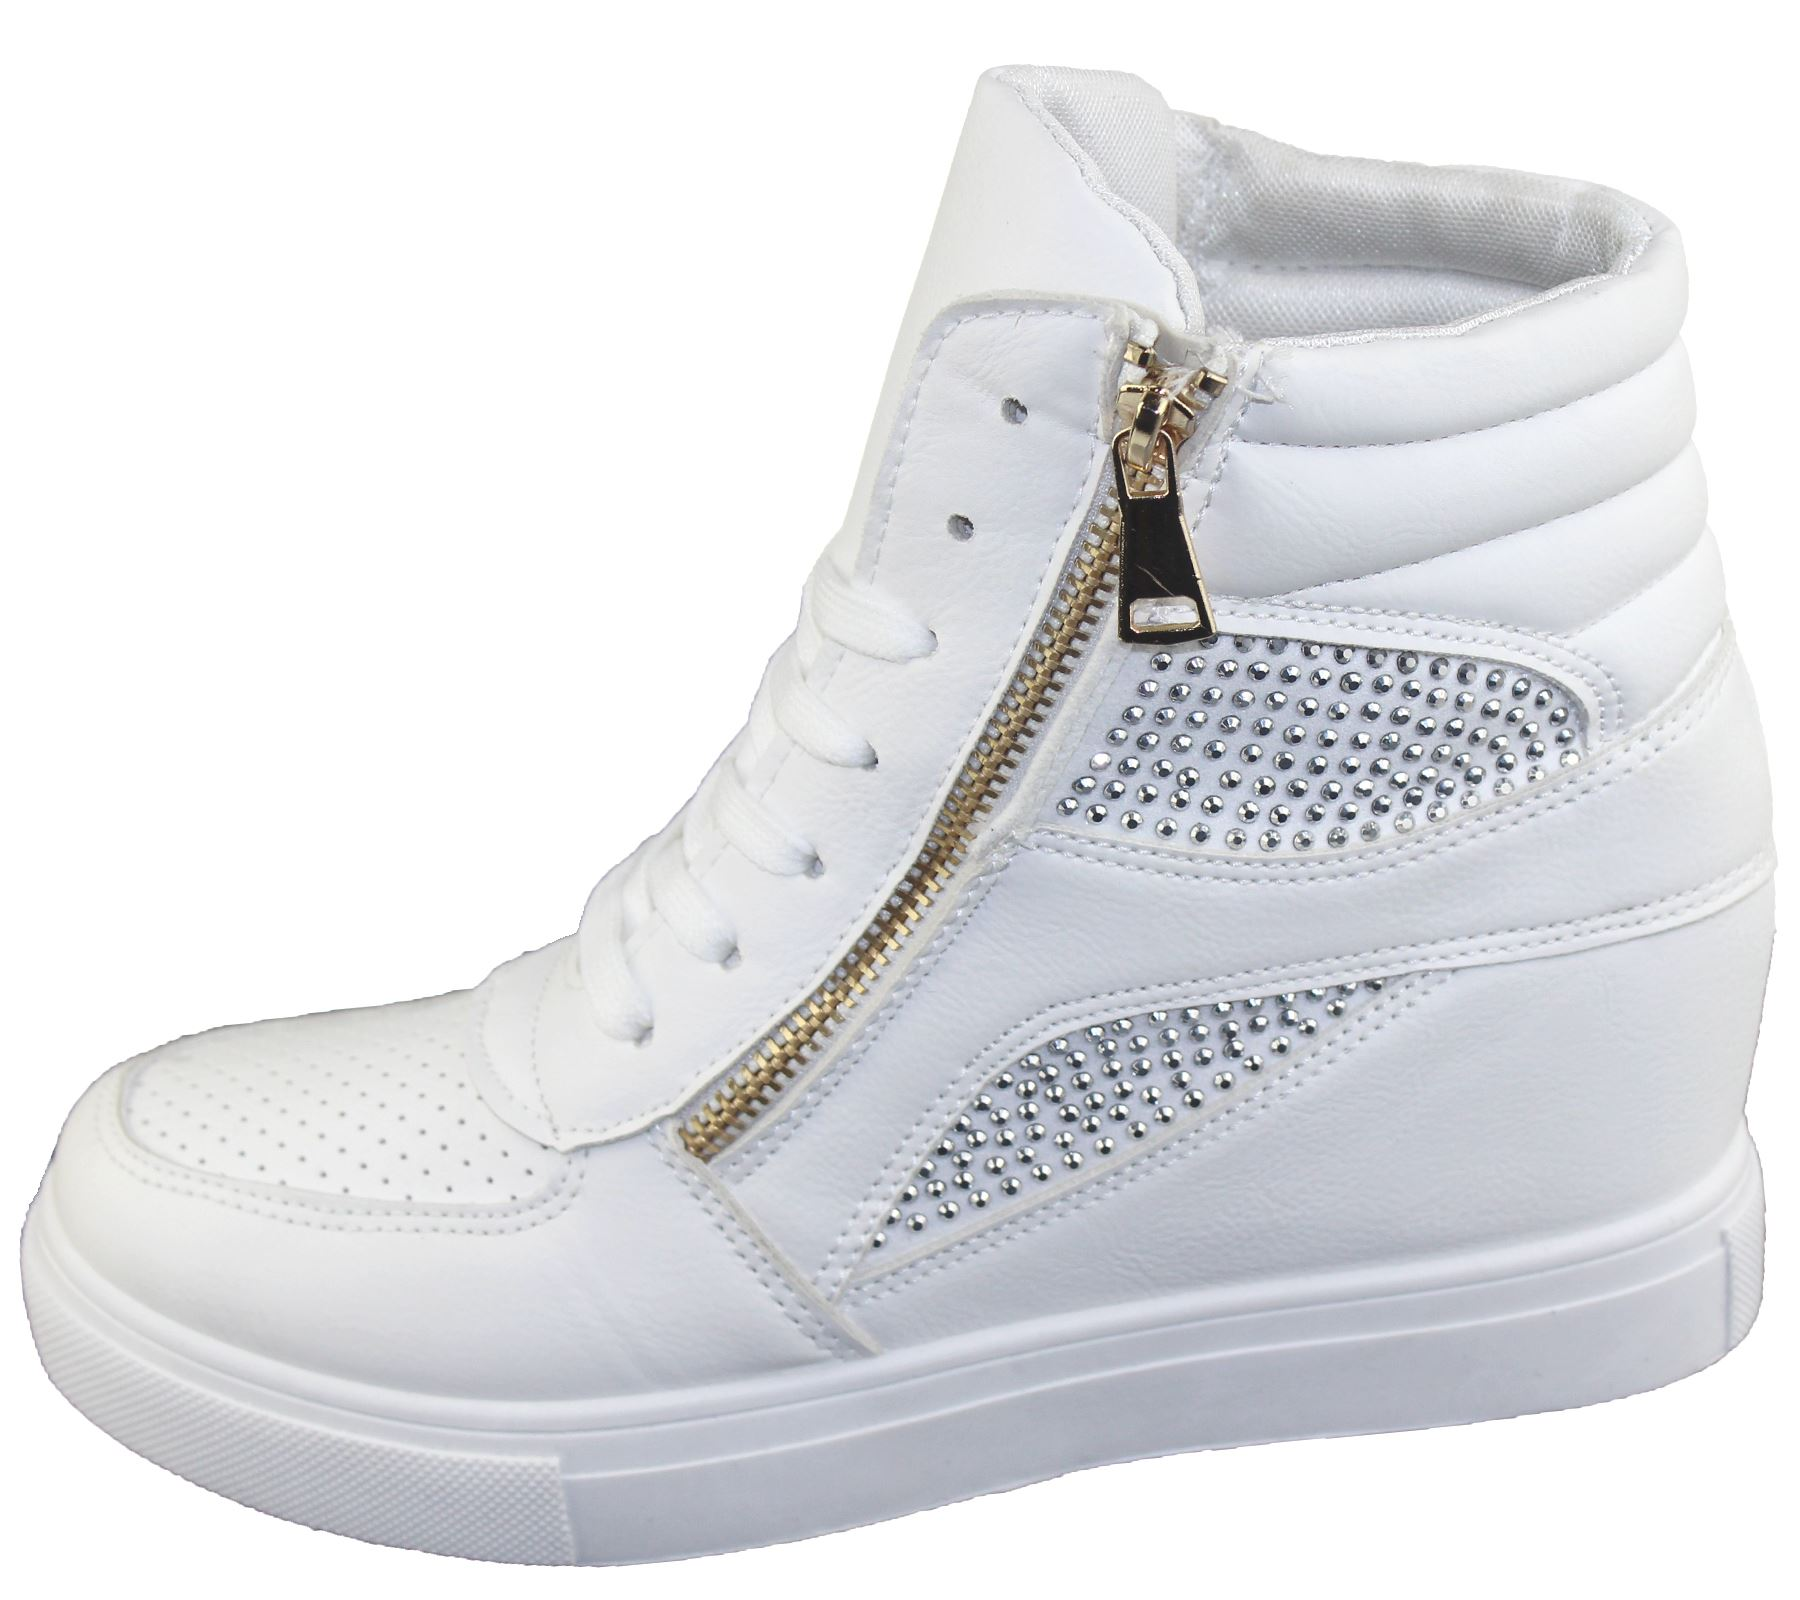 Philipp Plein Shoes Heels